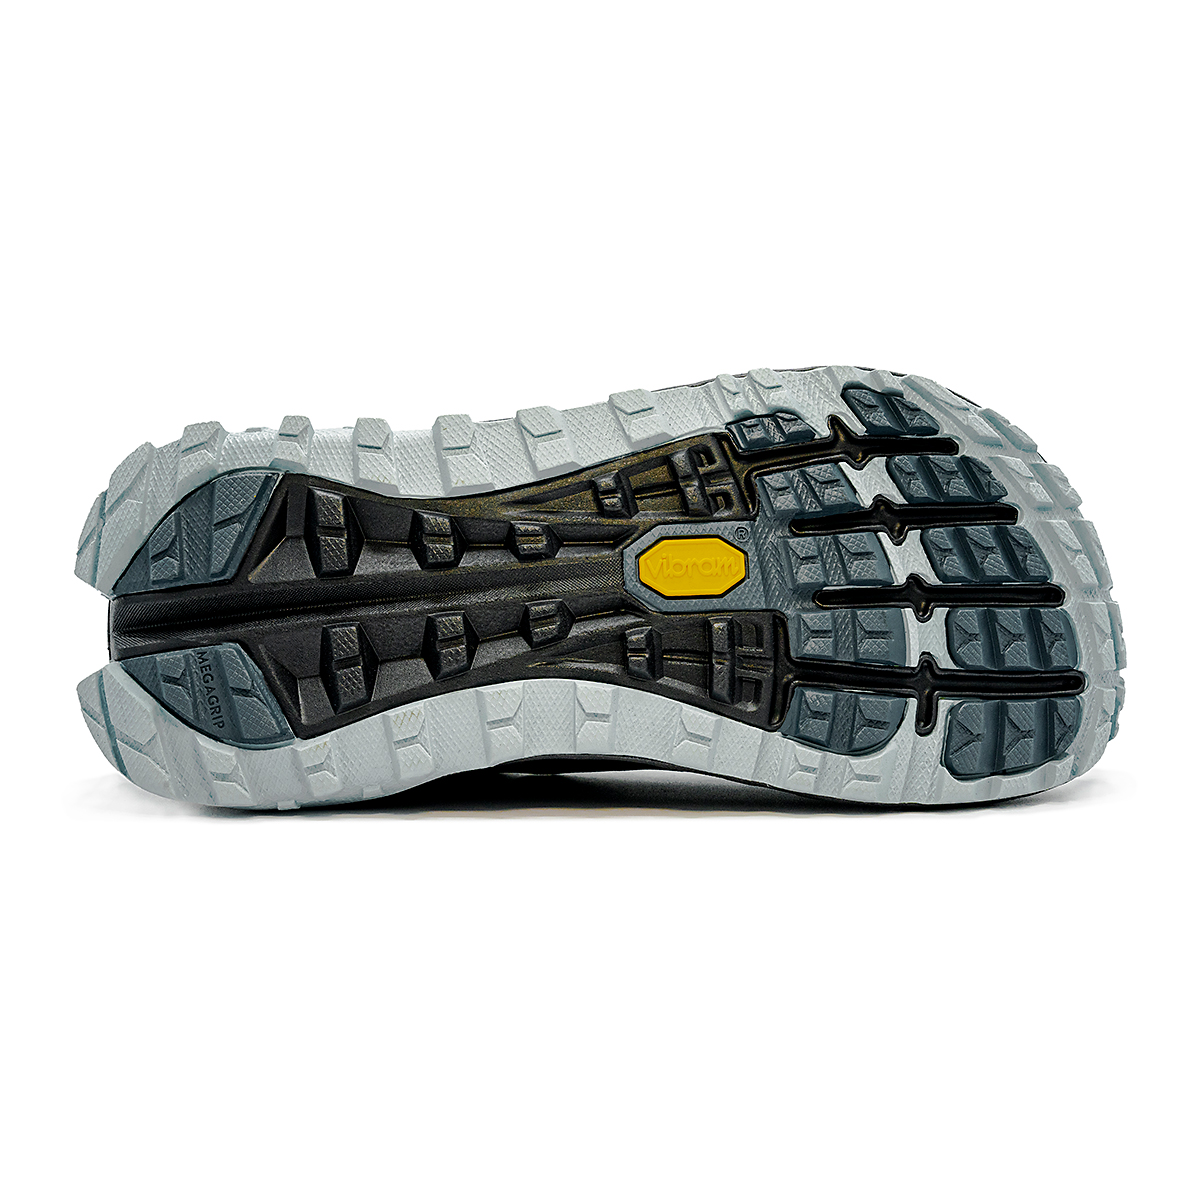 Women's Altra Olympus 4 Trail Running Shoe - Color: Black/Light Blue - Size: 5.5 - Width: Regular, Black/Light Blue, large, image 4